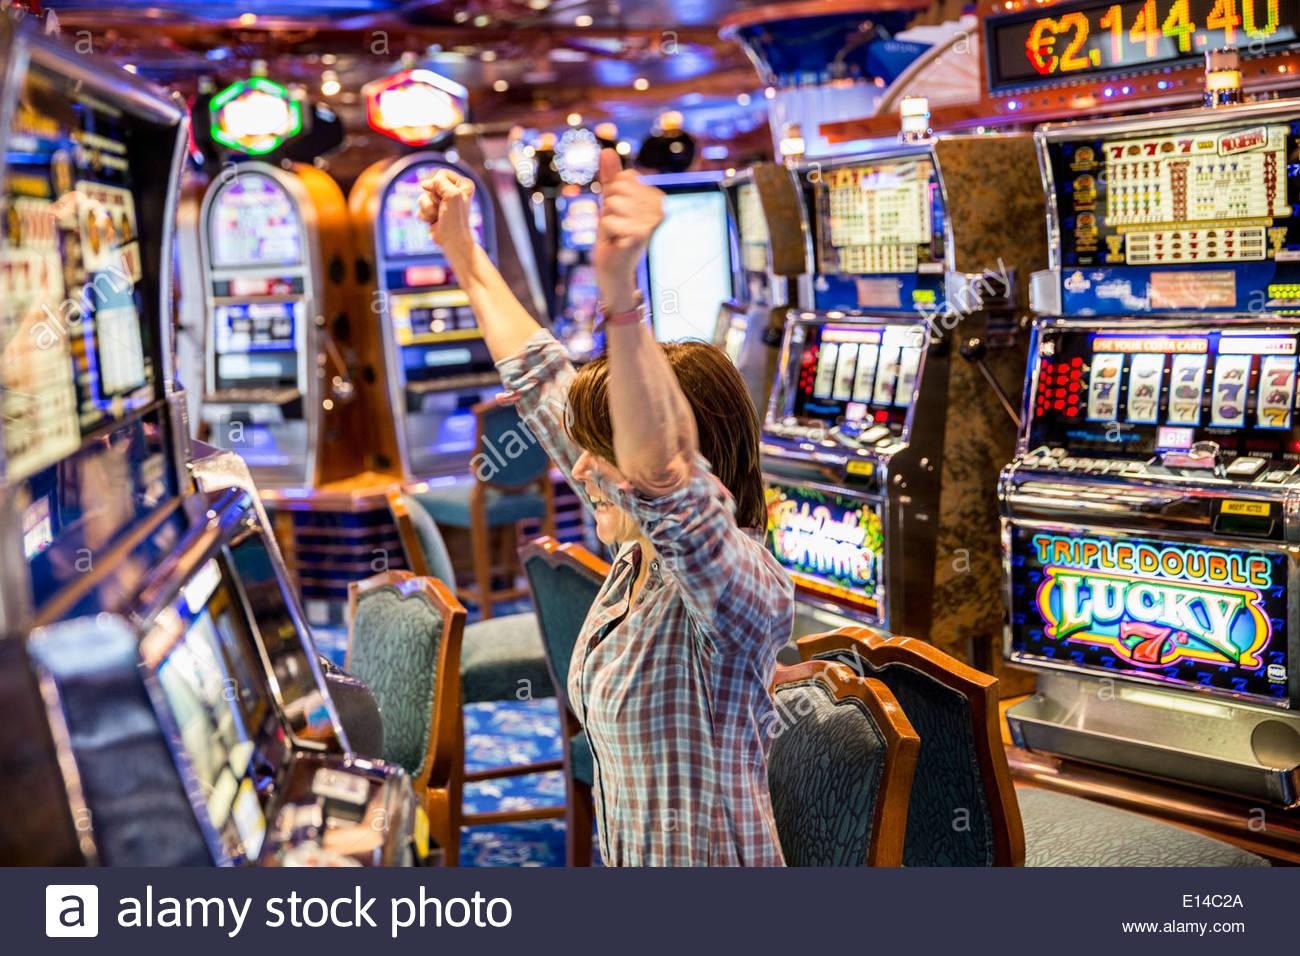 Dubai gambling monster high haunted online free